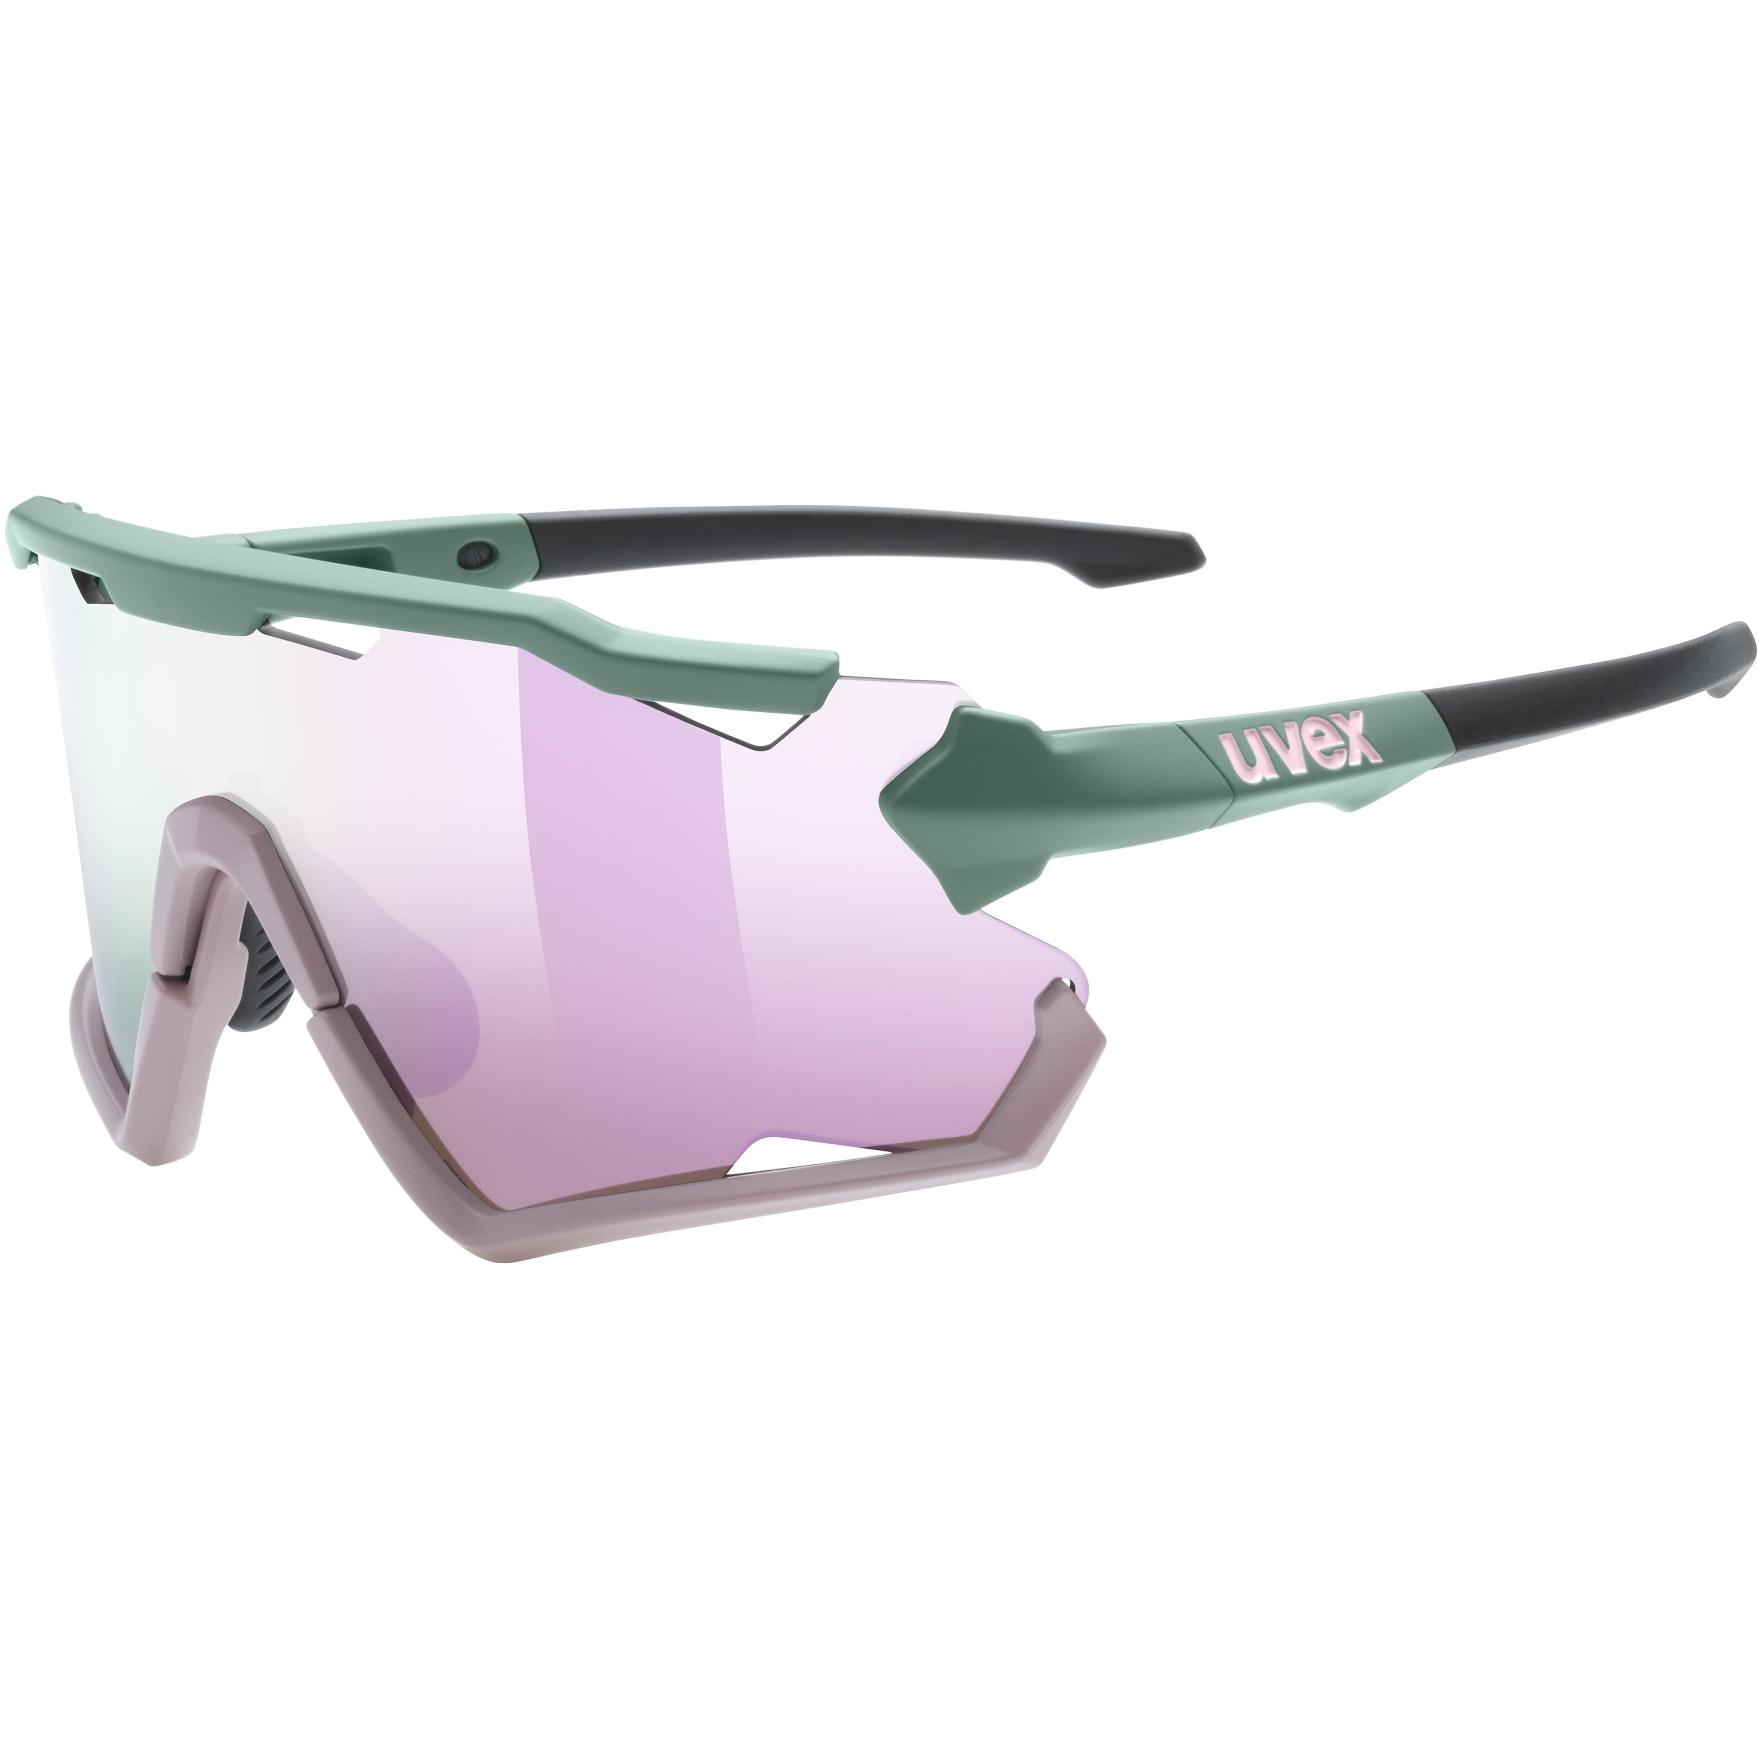 Uvex sportstyle 228 Glasses - moss rose mat/mirror rose